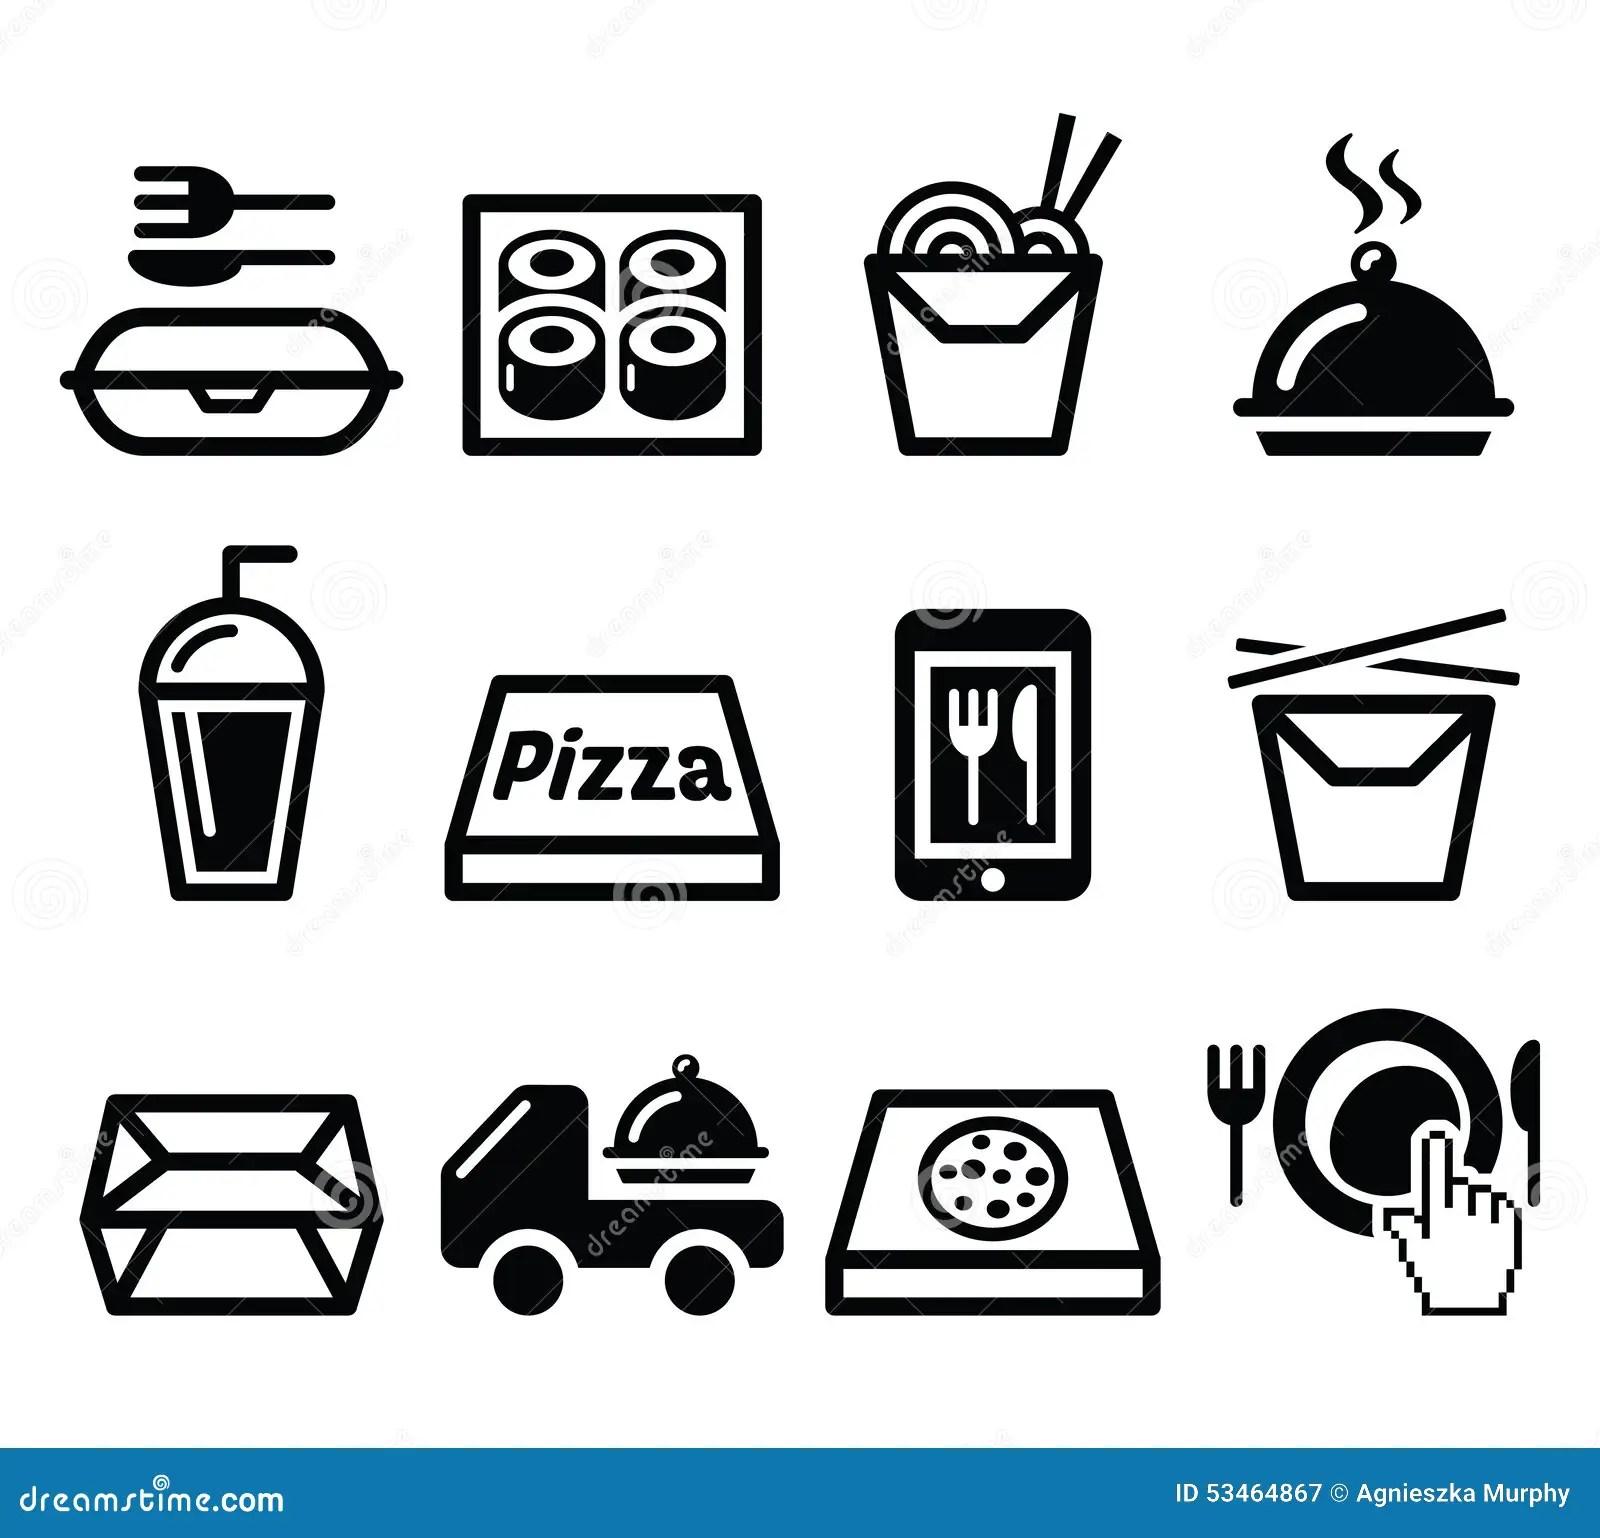 Take Away Box Meal Icons Set Stock Photo